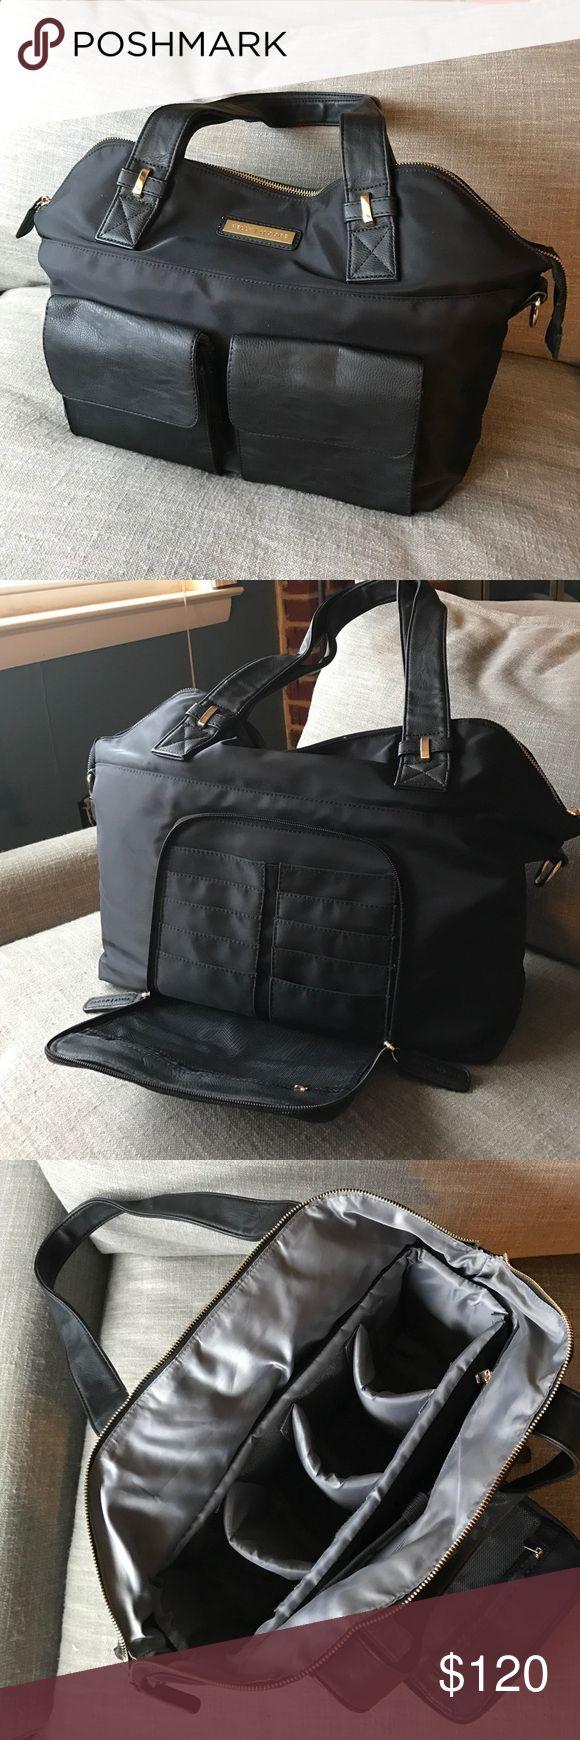 Kelly Moore black Ponder camera bag Kelly Moore camera bag, style Ponder, all black! Only used twice, in perfect condition. kelly moore Bags Shoulder Bags